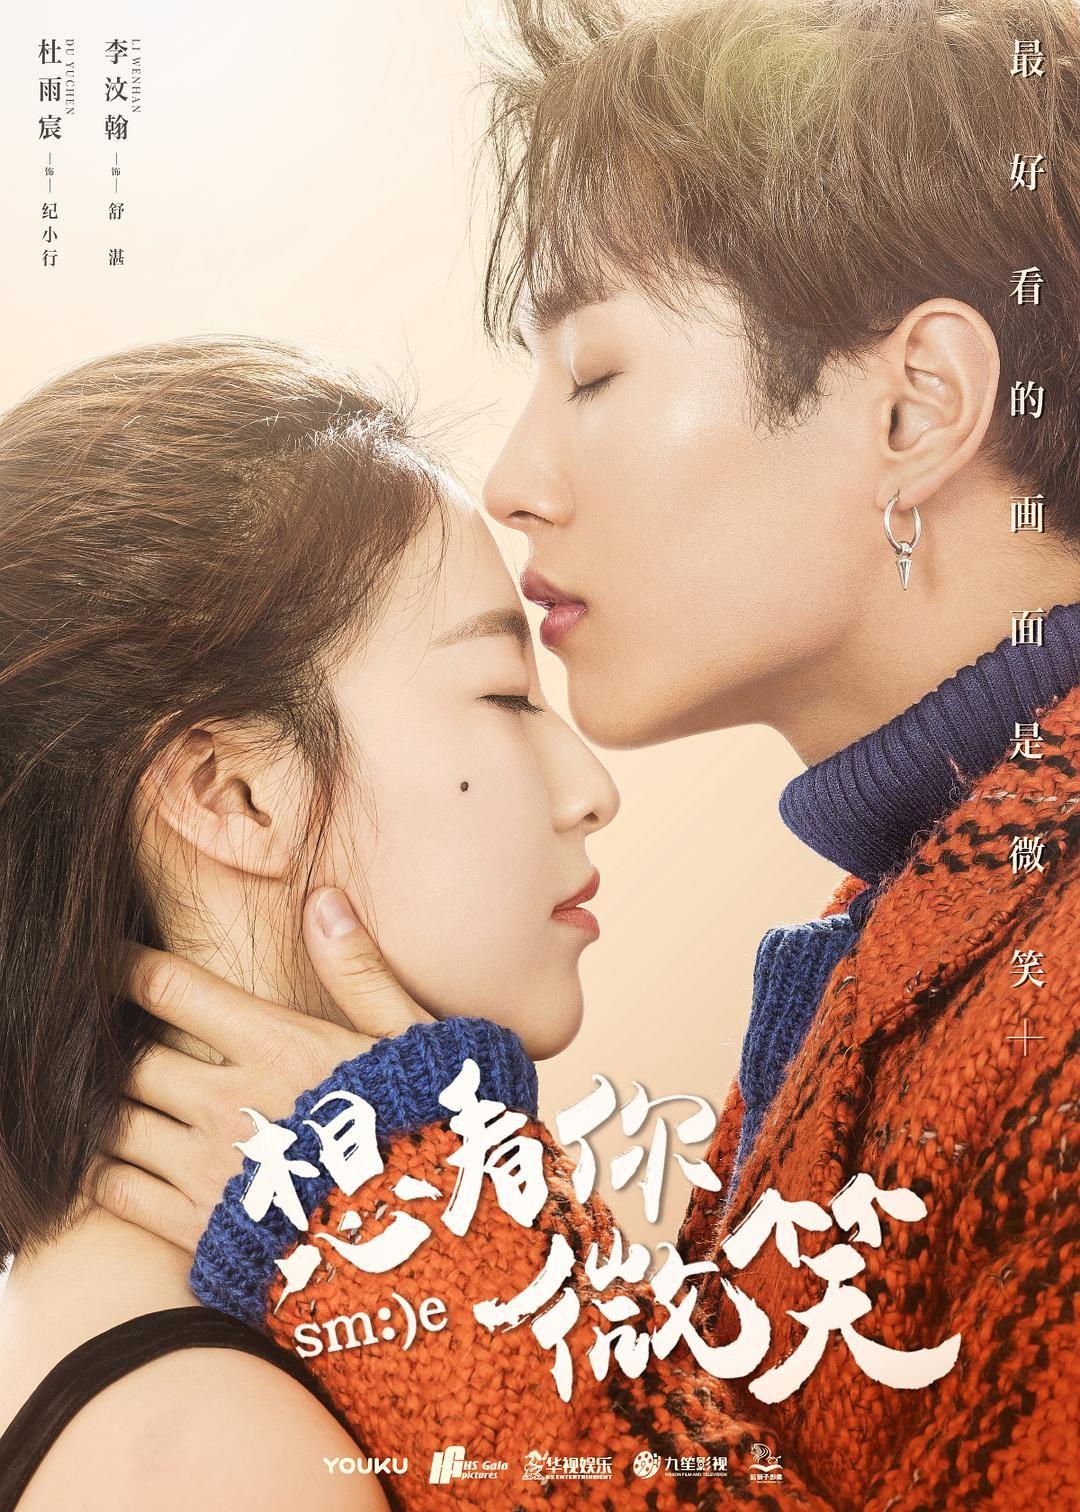 Just Want To See You Smile Engsub 2018 Chinese Drama Viewasian In 2020 Korean Drama Romance Chines Drama Japanese Drama